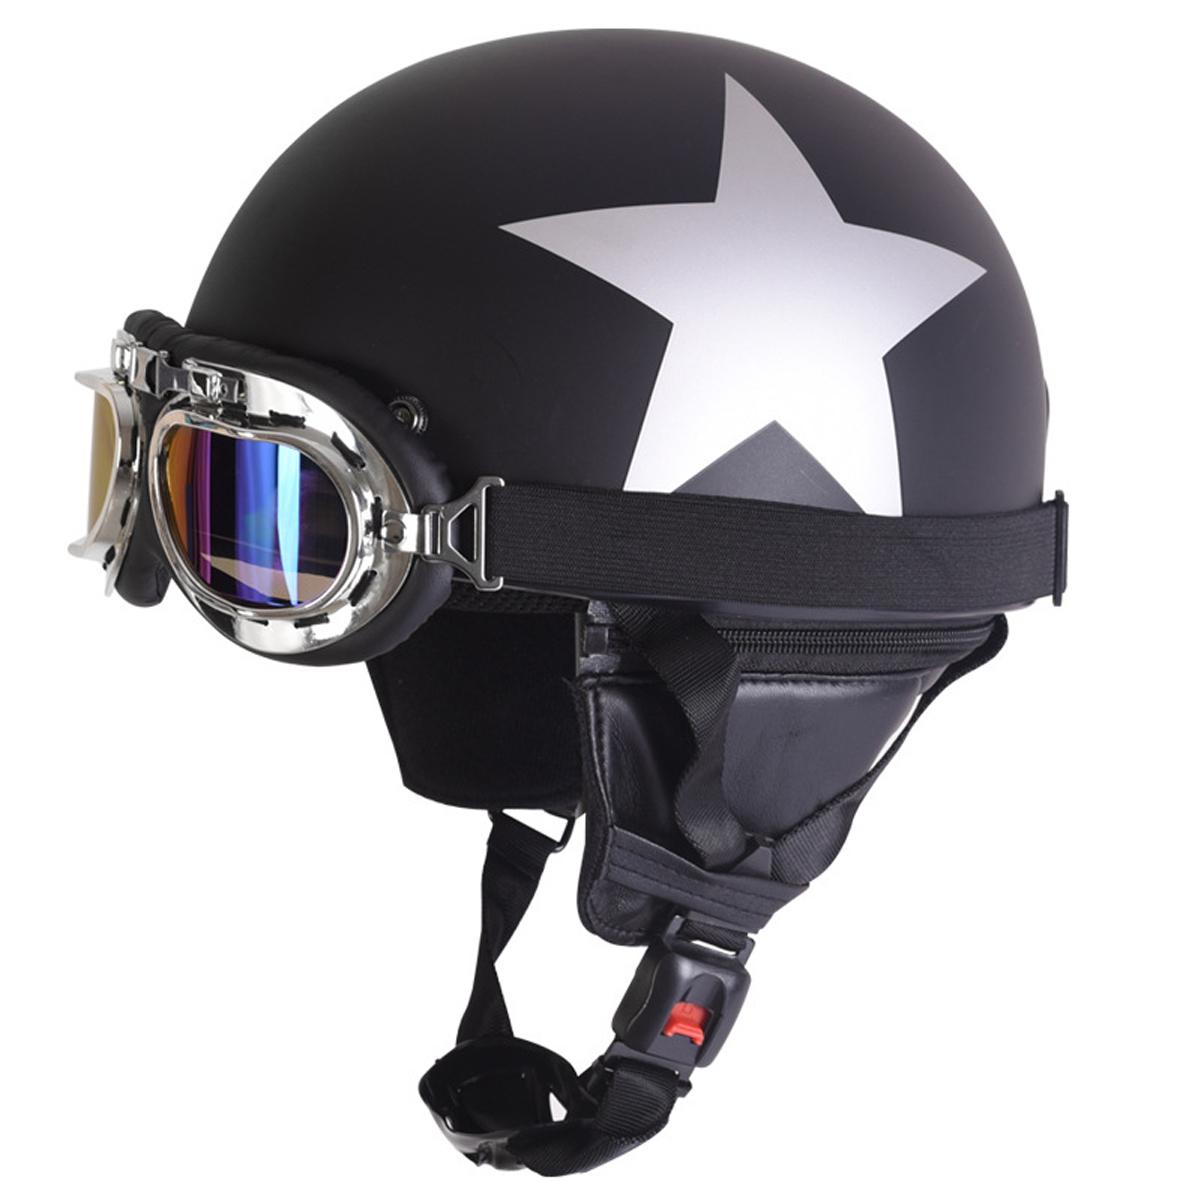 Retro Vintage Motorcycle Helmet Safety Half Helmet with ...